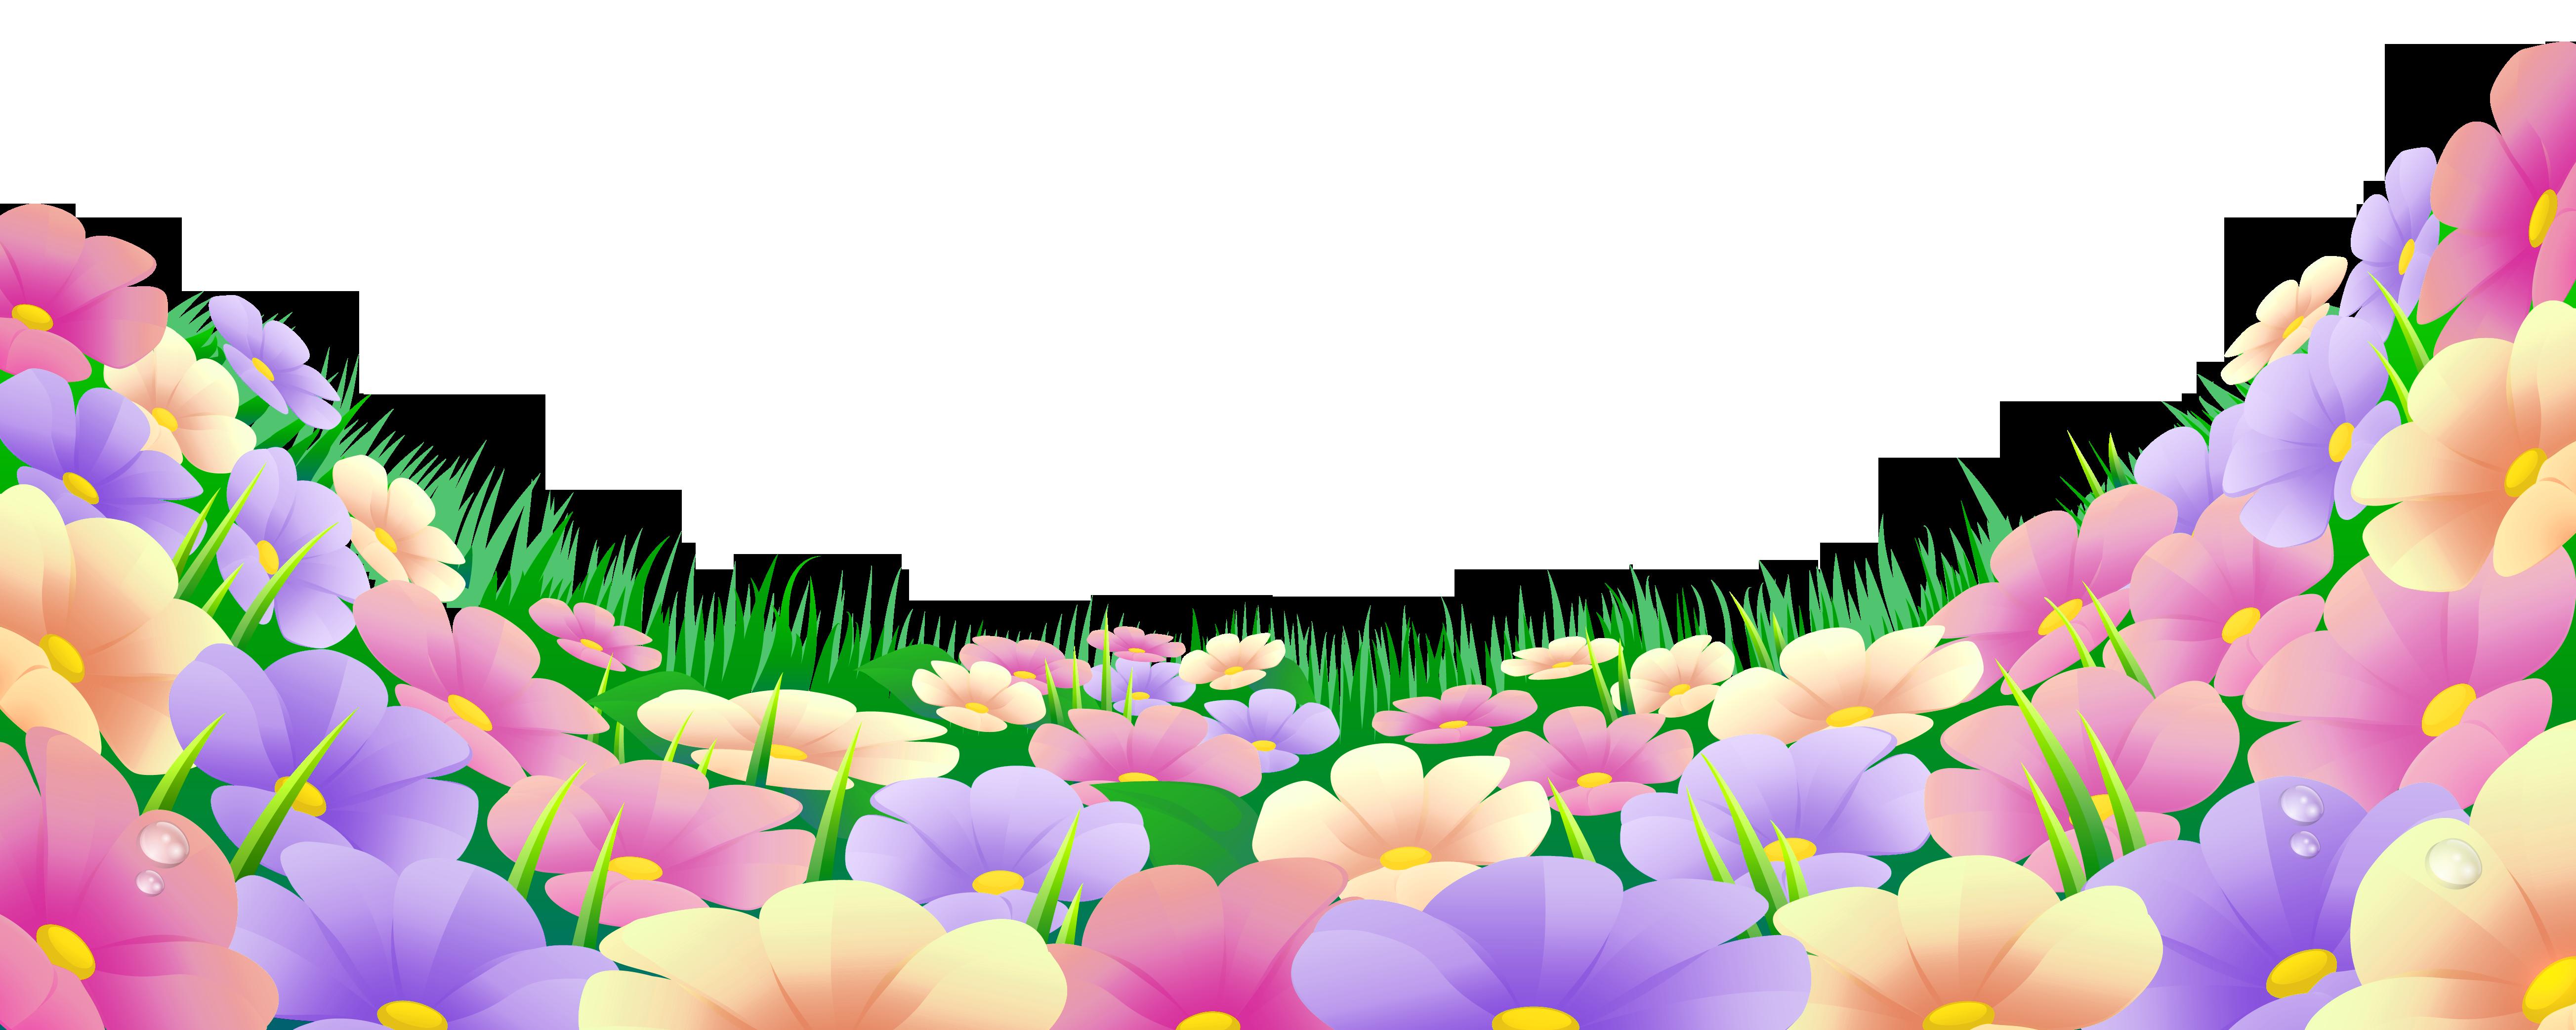 Background hoa đẹp nhất